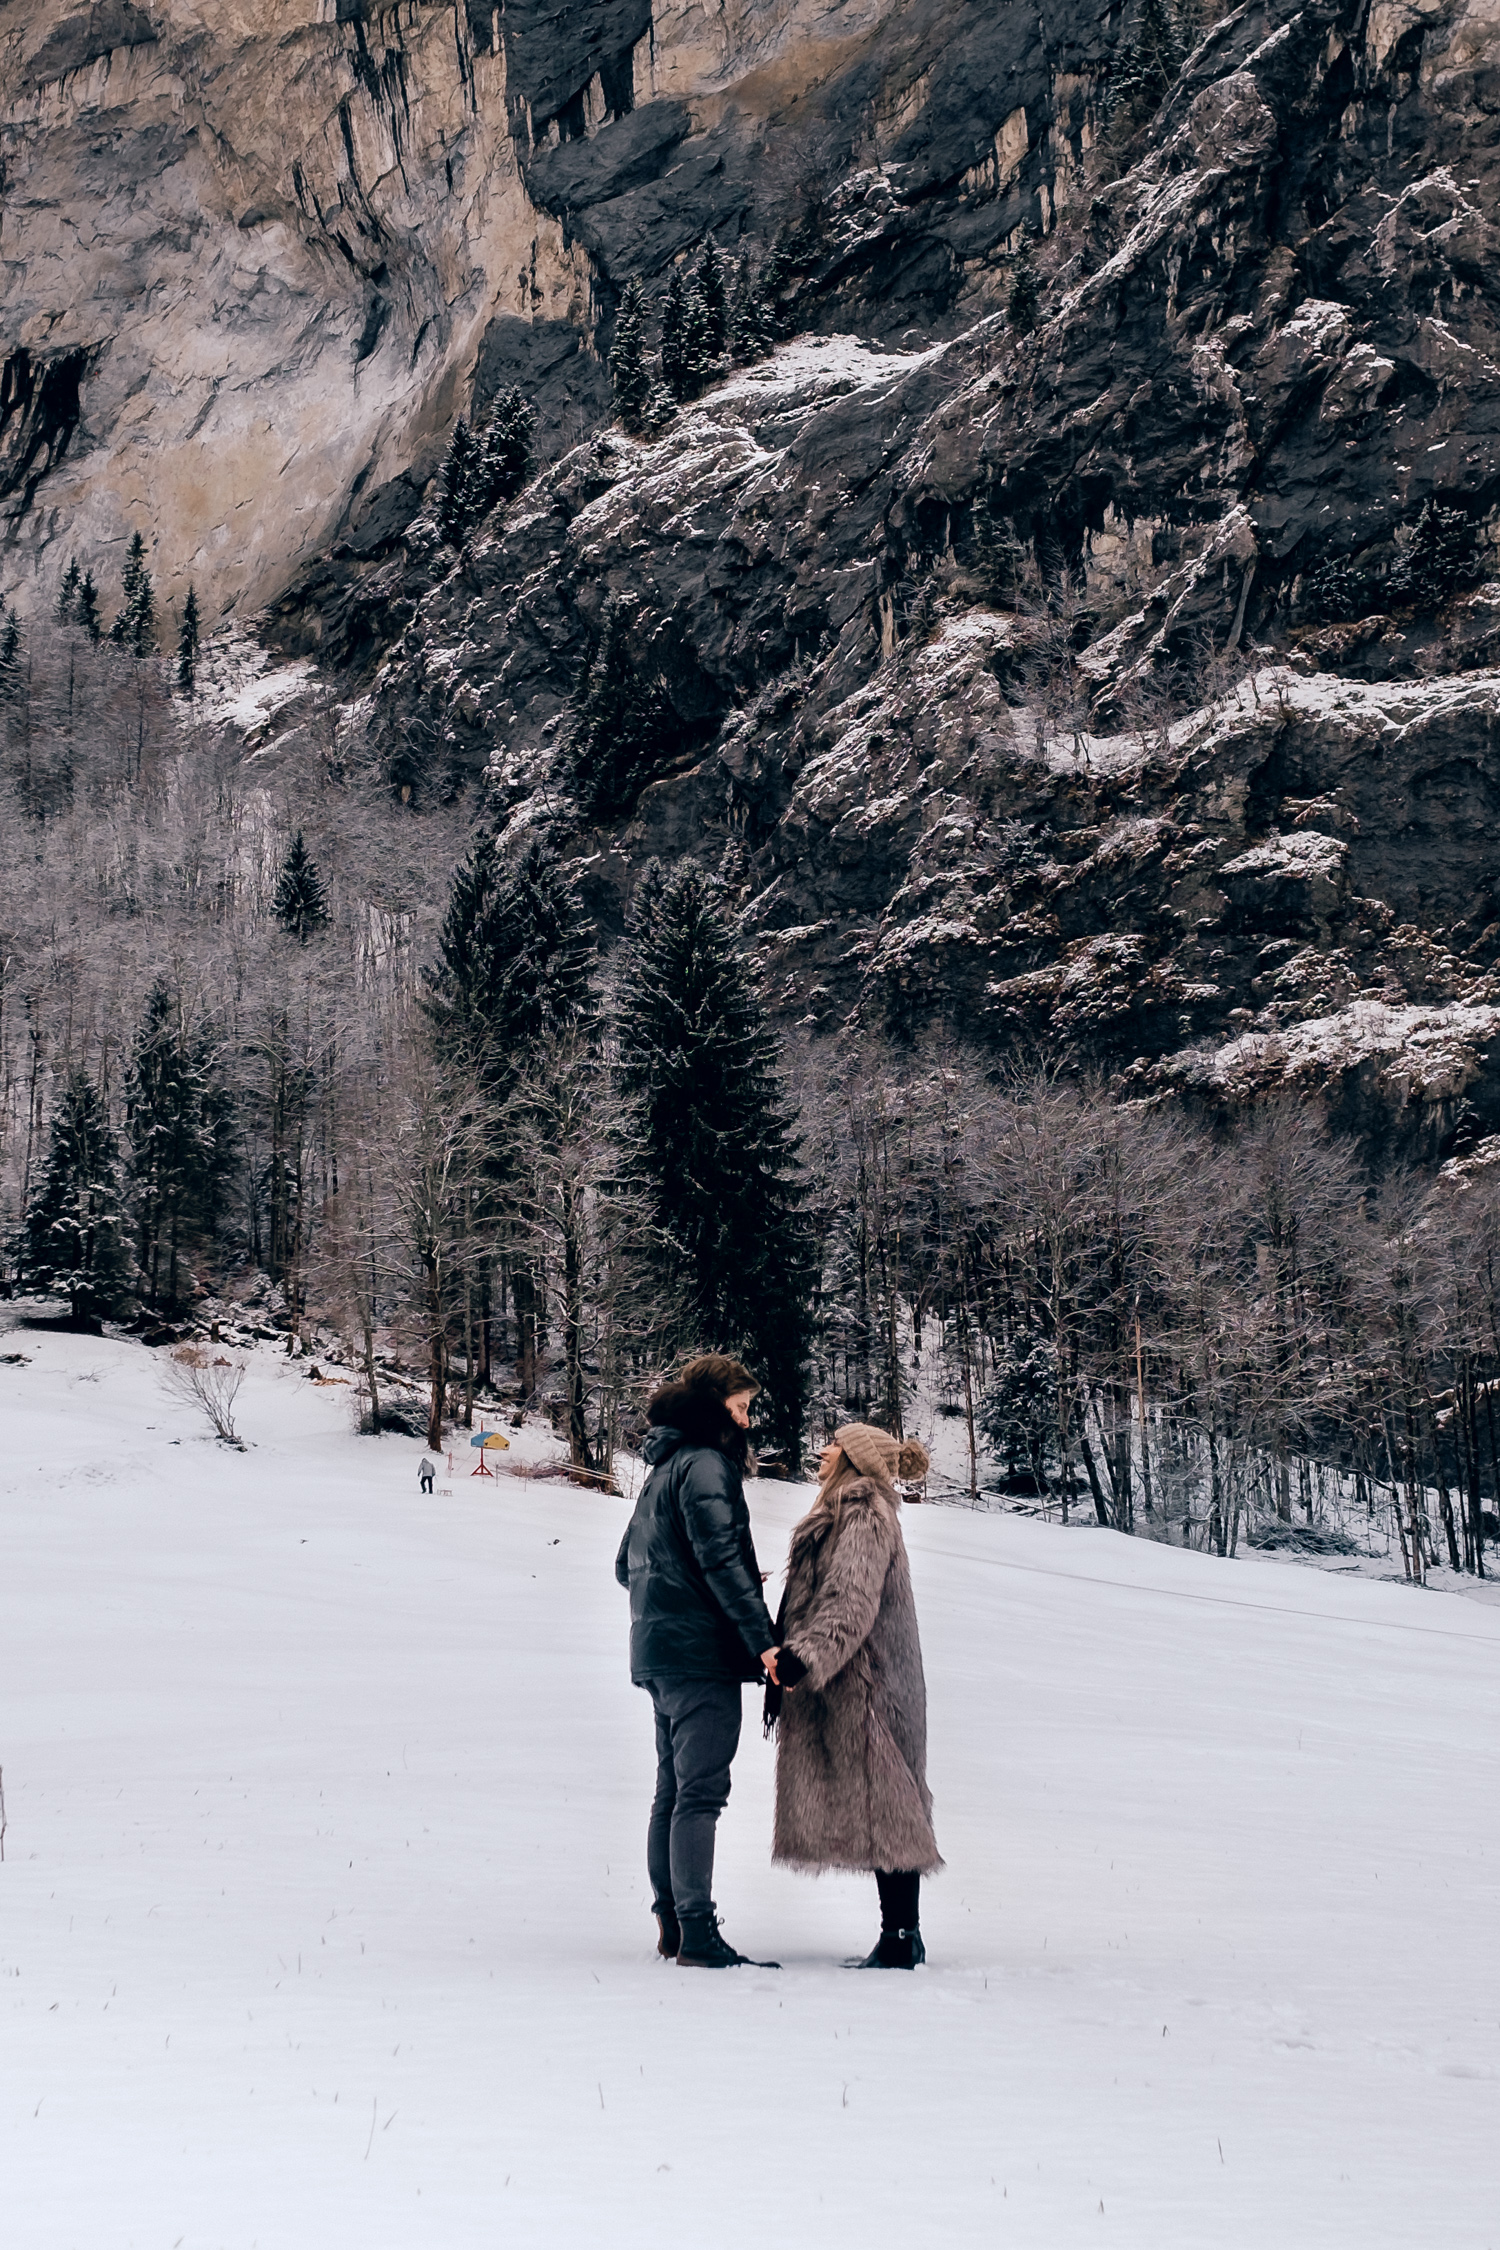 partimetravelers travel bloggers blog travel switzerland photography winter video ber interlaken lauternbrunen grindwald berno fashion